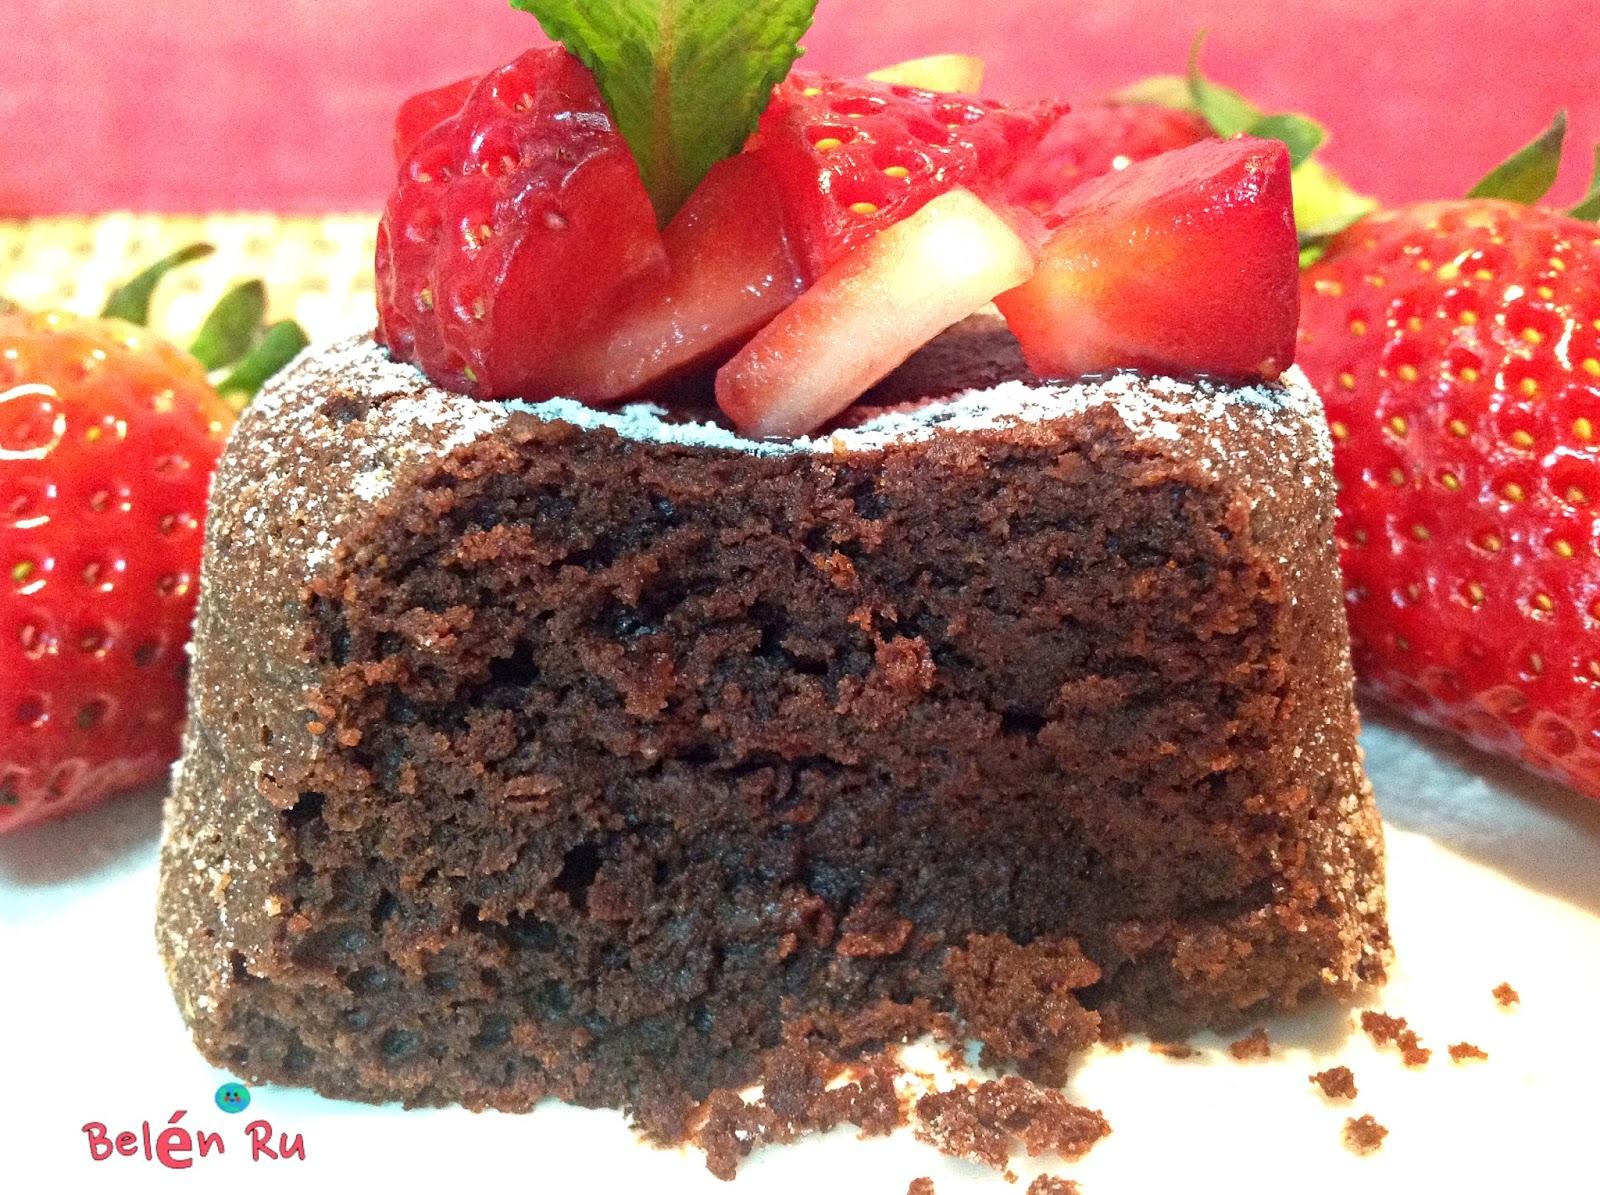 Tiramisú de limón - BelénRu: Brownies mini de chocolate con aceite de coco